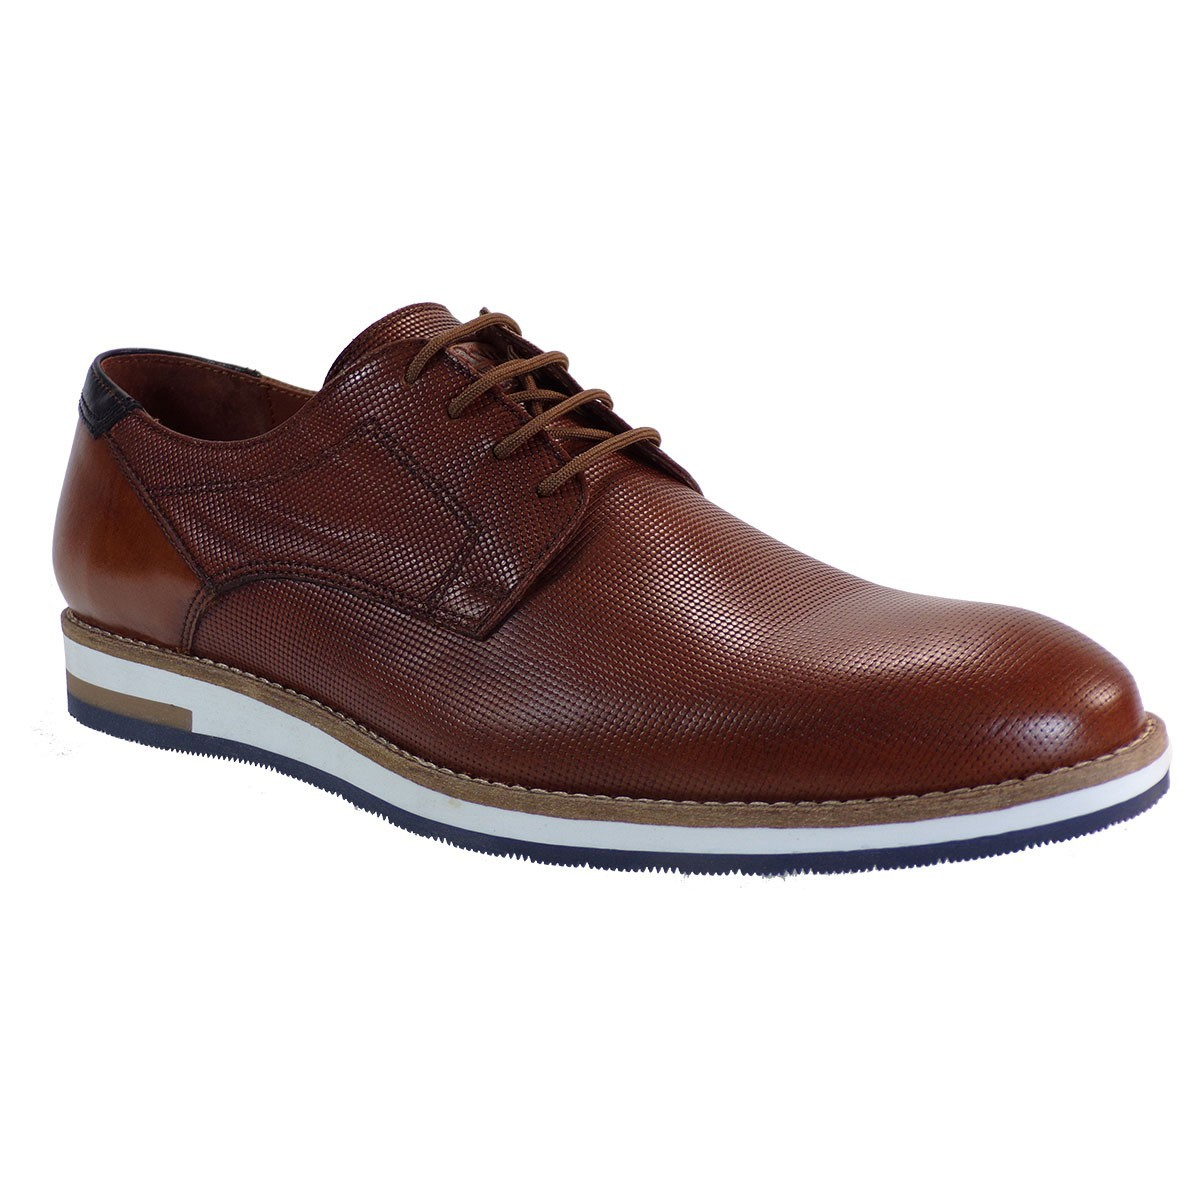 Robinson Ανδρικά Παπούτσια 2131 Ταμπά Δέρμα